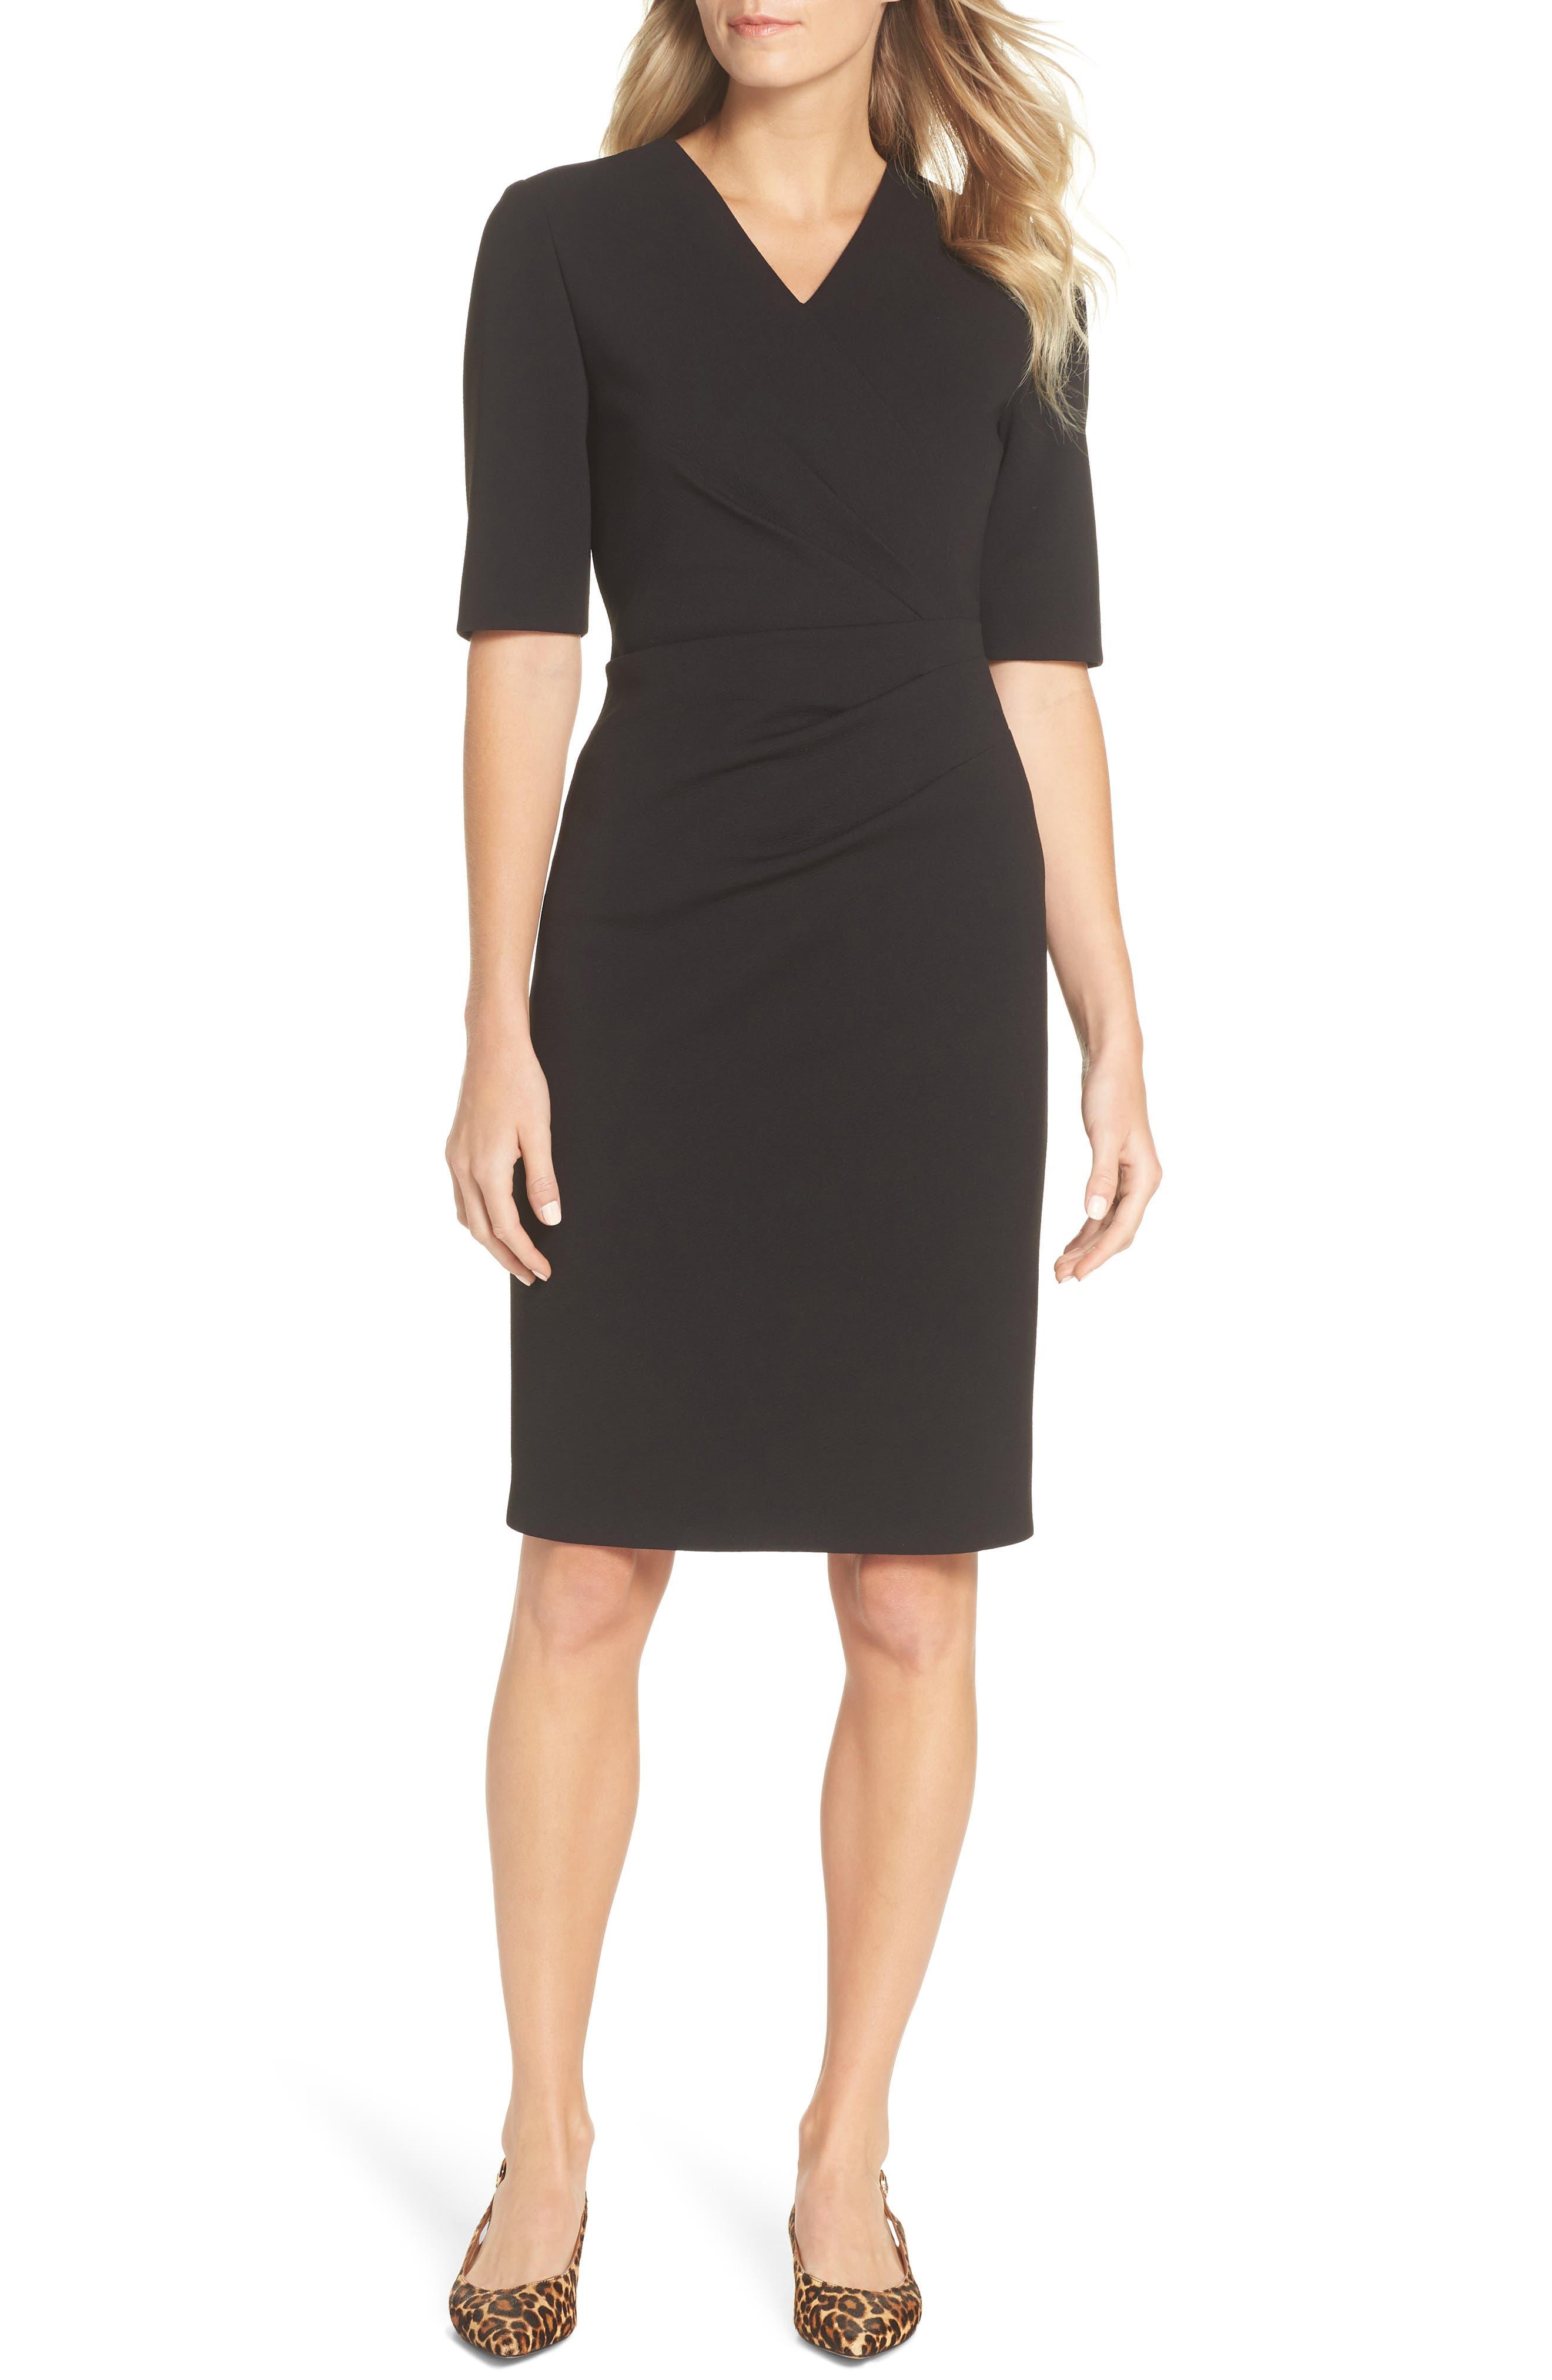 TAHARI, Scuba Crepe Sheath Dress, Main thumbnail 1, color, BLACK